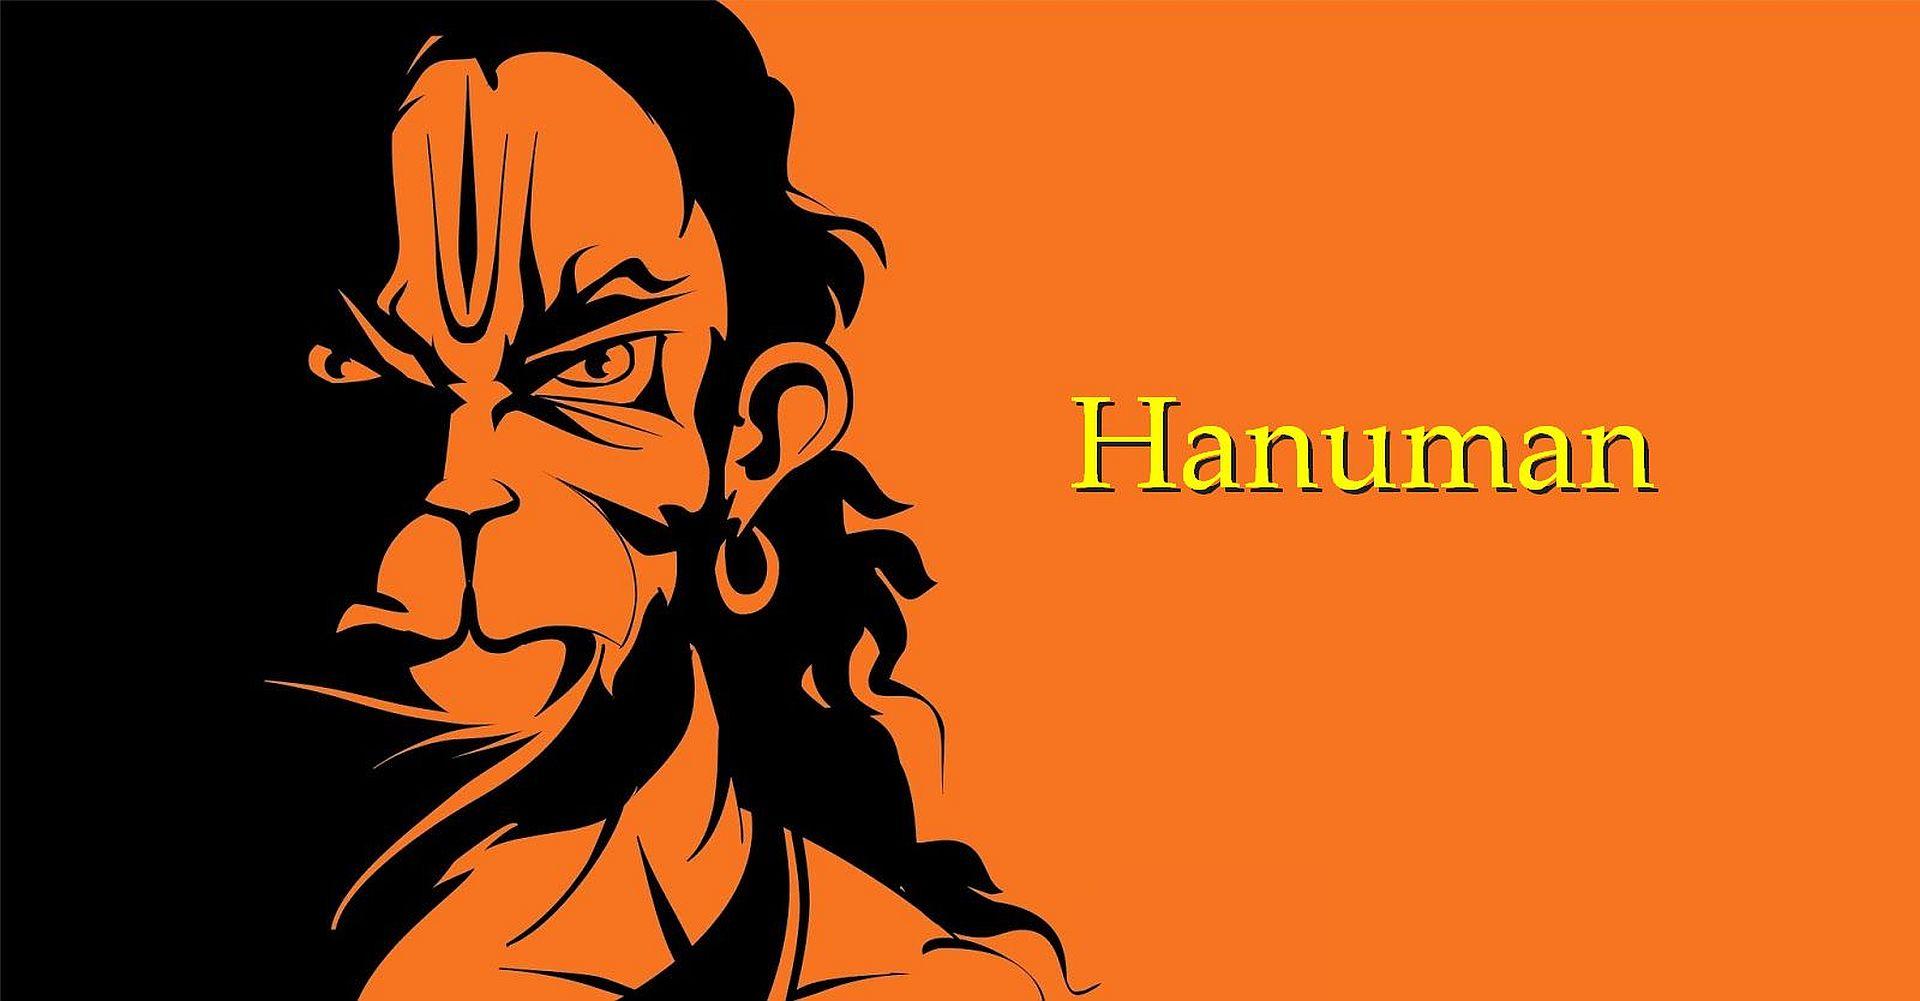 angry hanuman hd wallpaper 1080p labzada wallpaper